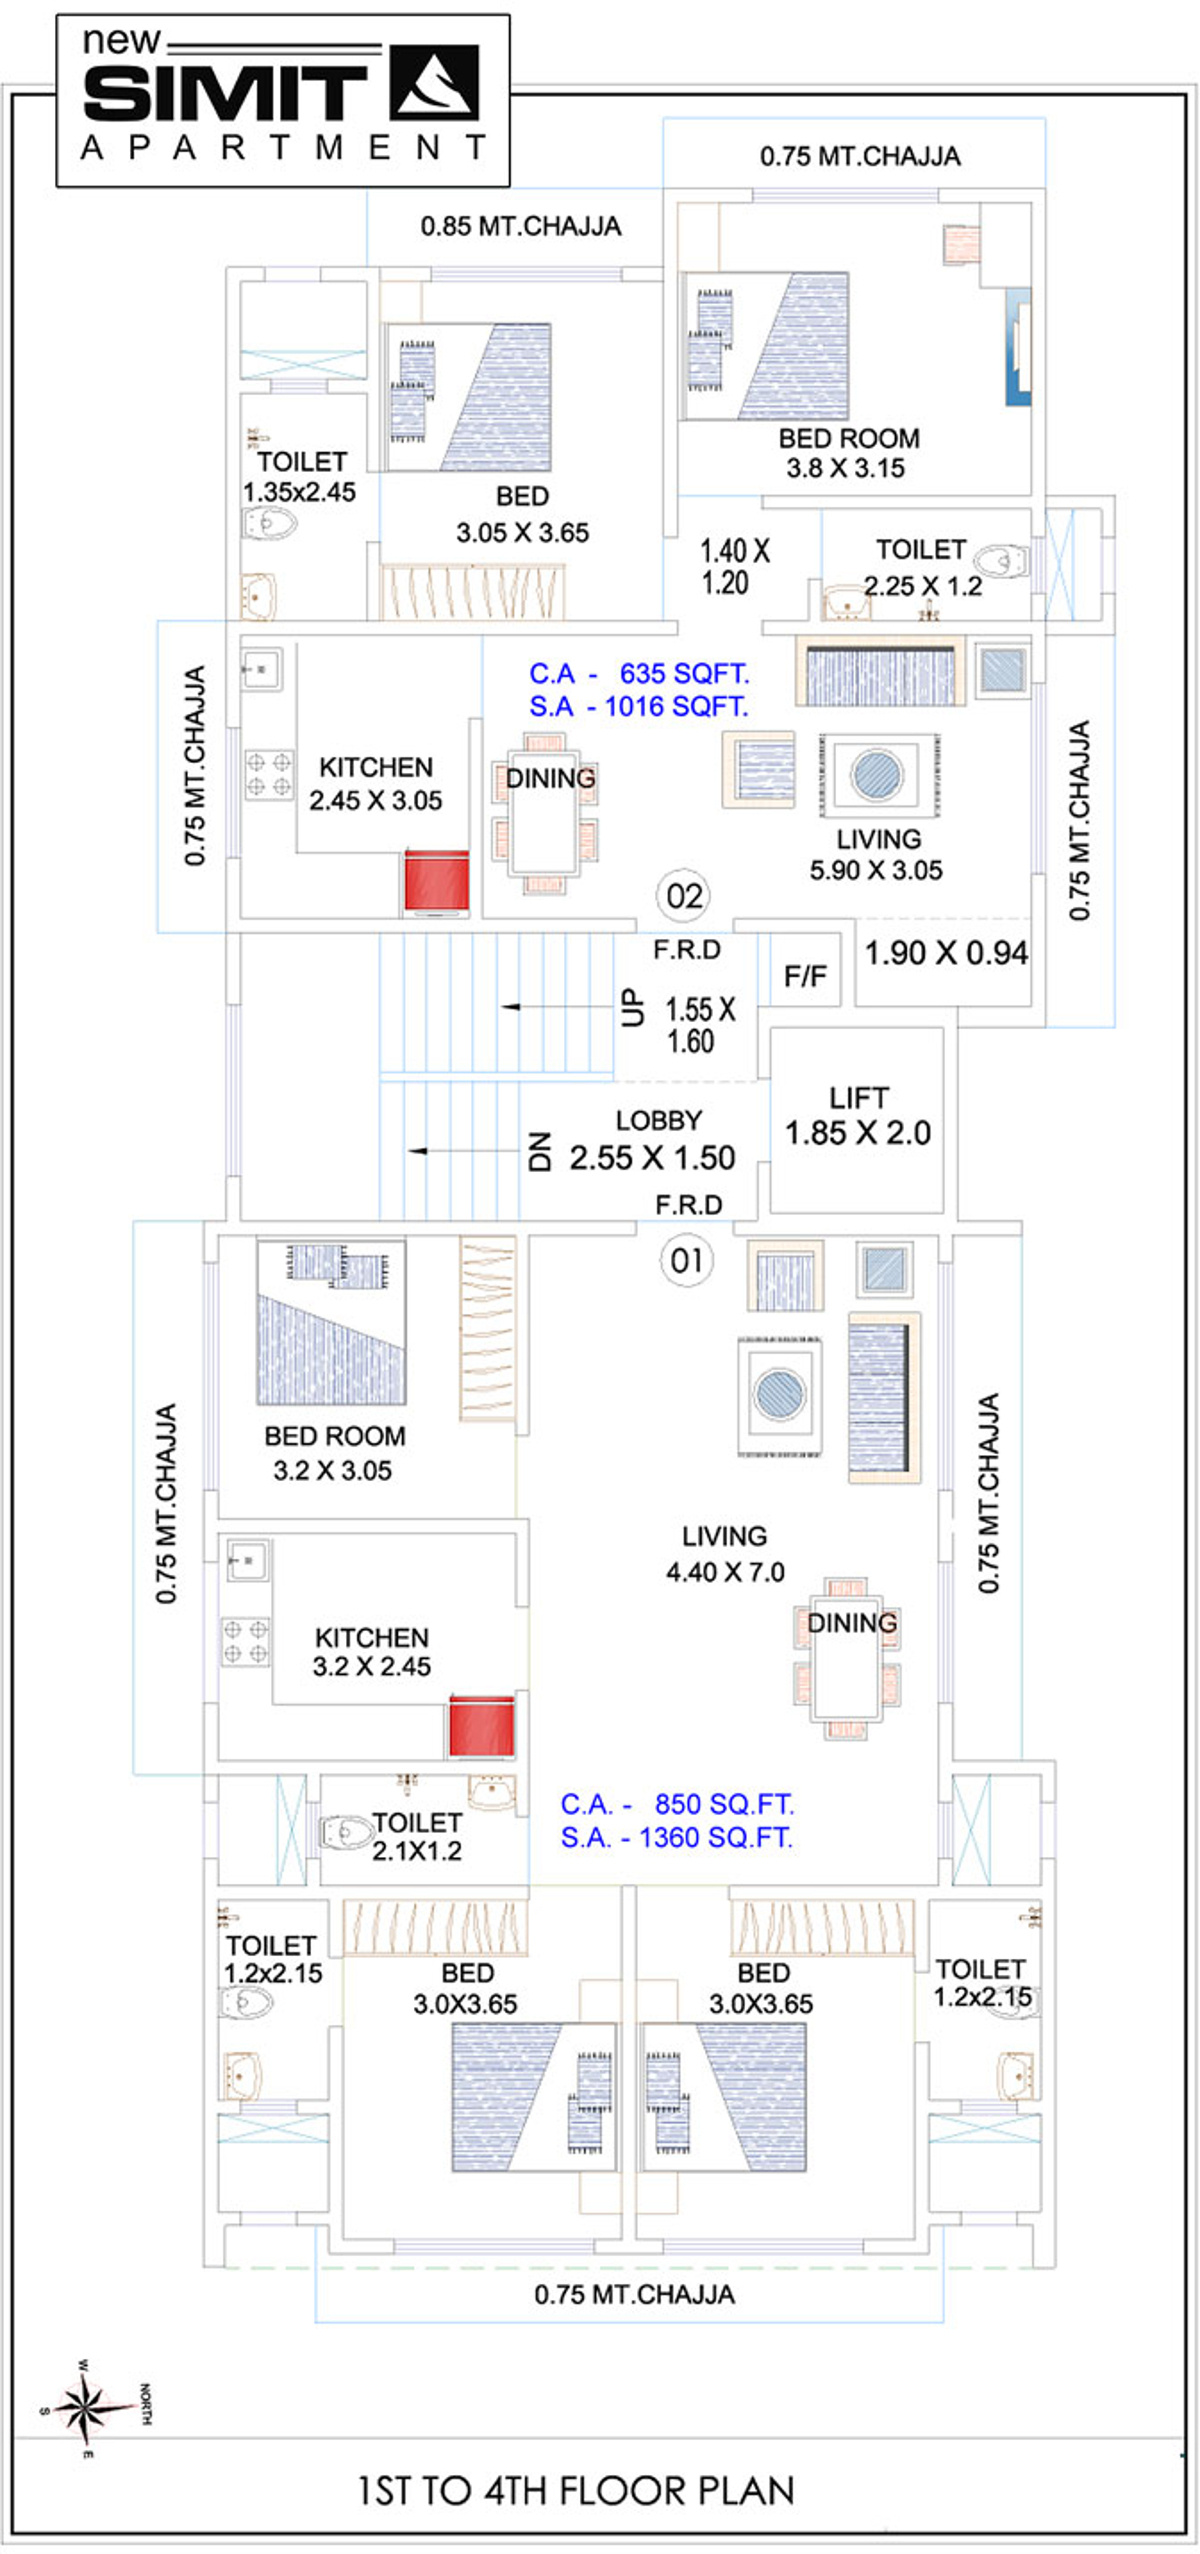 Reliable New Simit Apartment in Kandivali West Mumbai Price